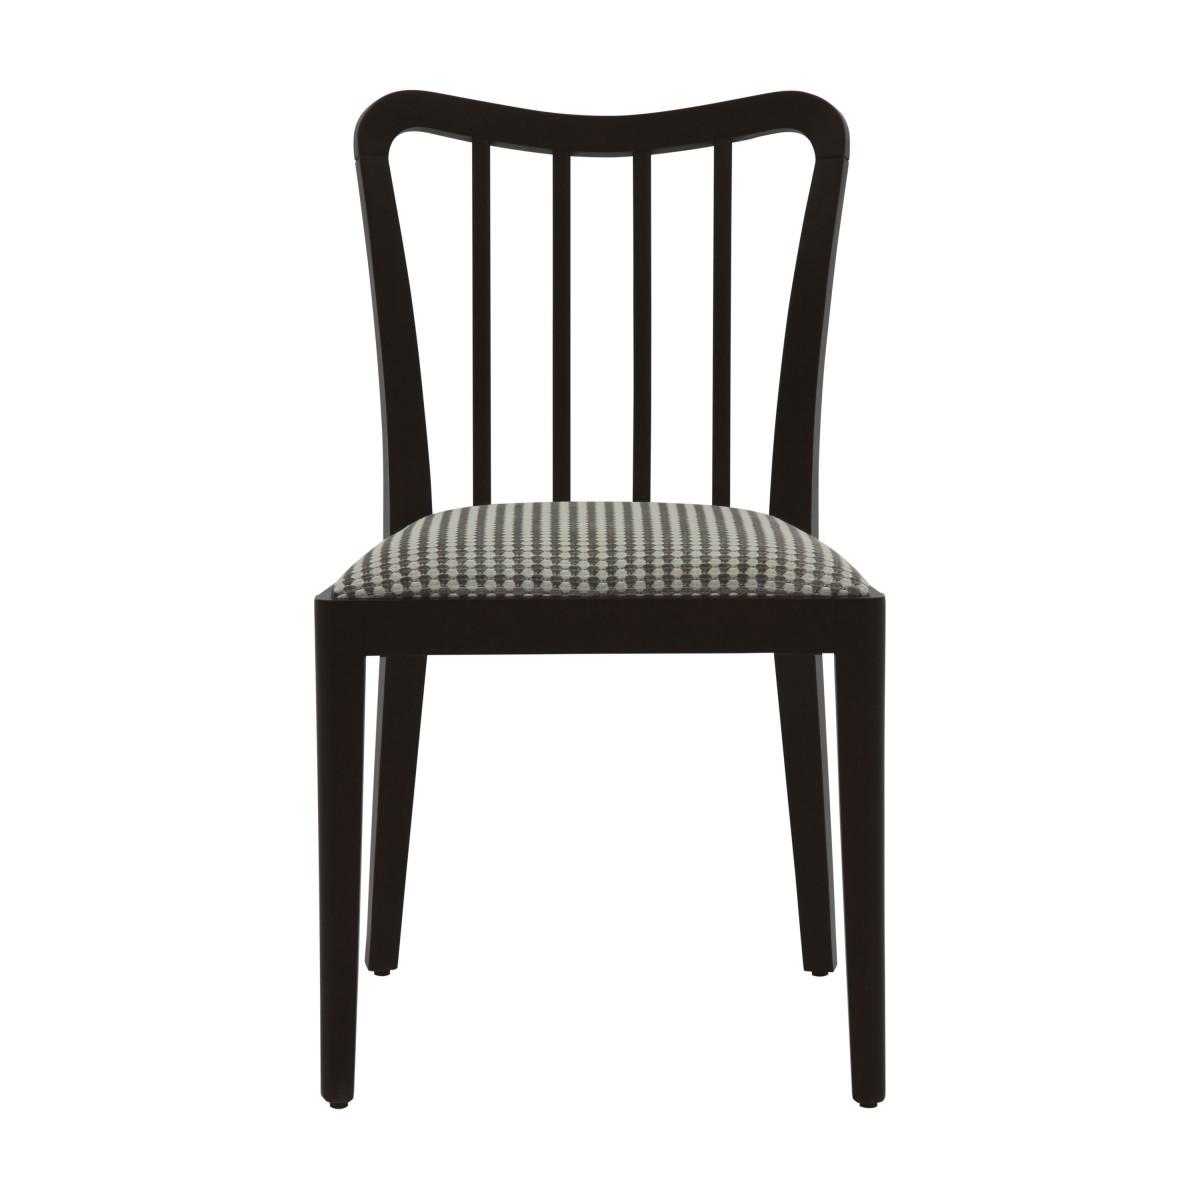 Chair Dernier - Sevensedie